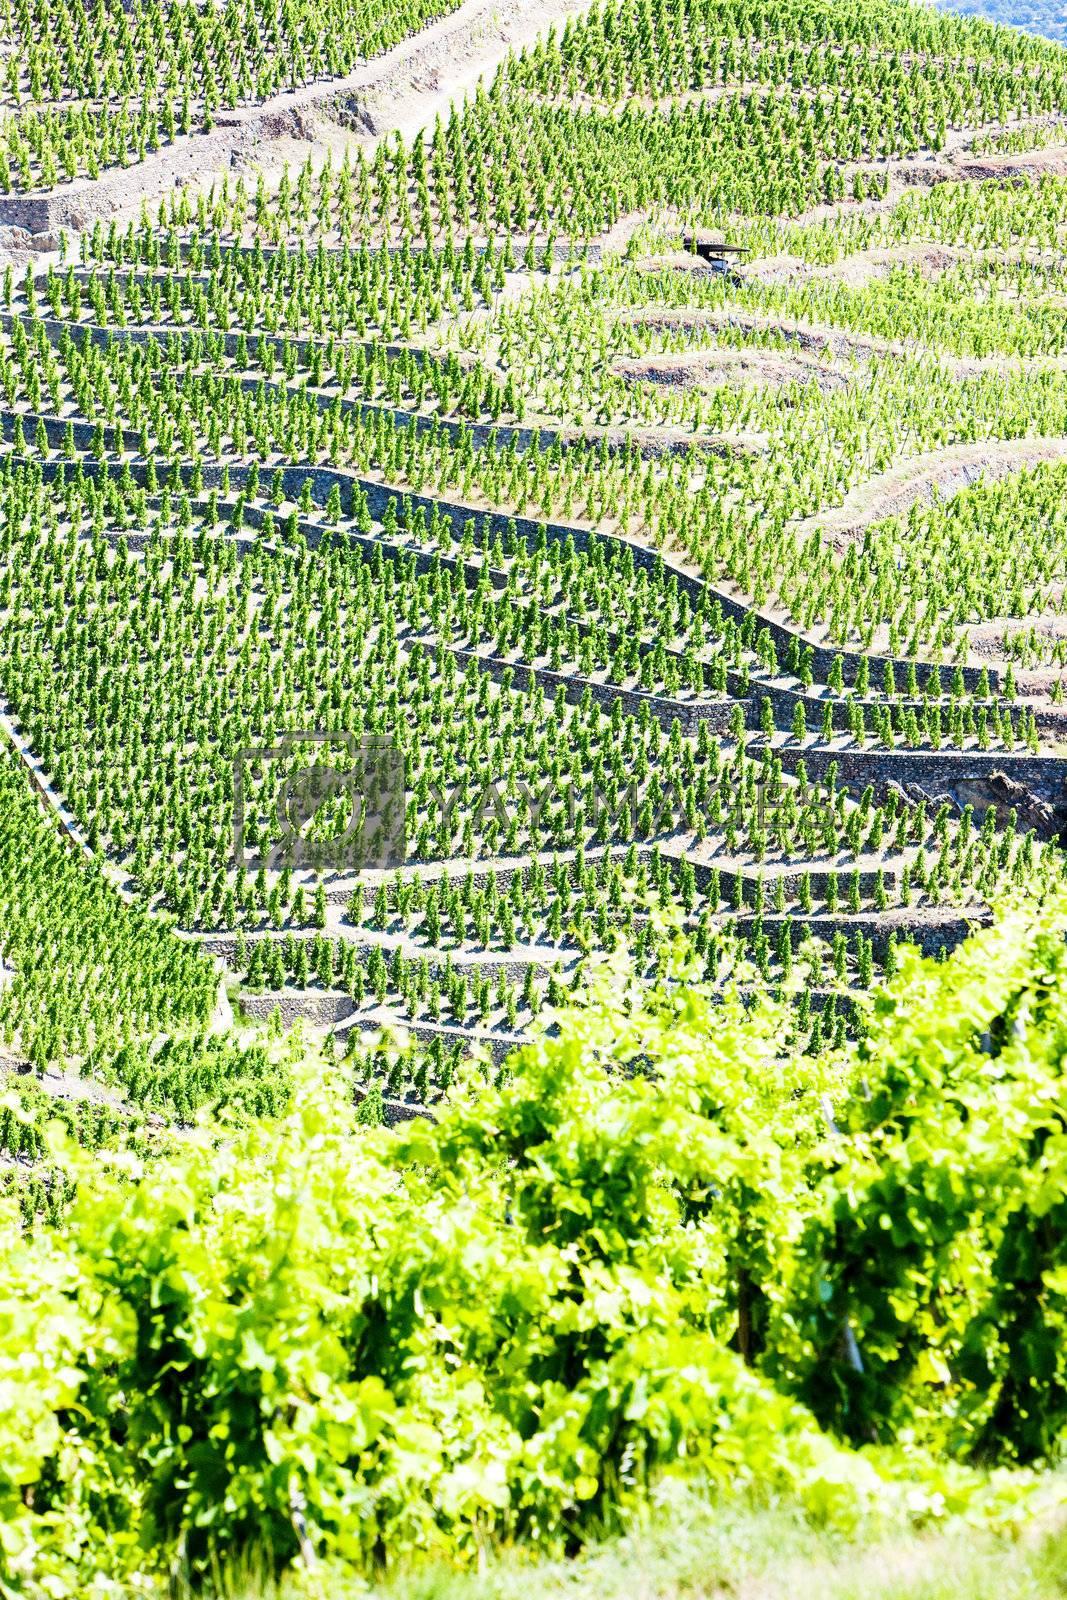 grand cru vineyards, Cote Rotie, Rhone-Alpes, France by phbcz